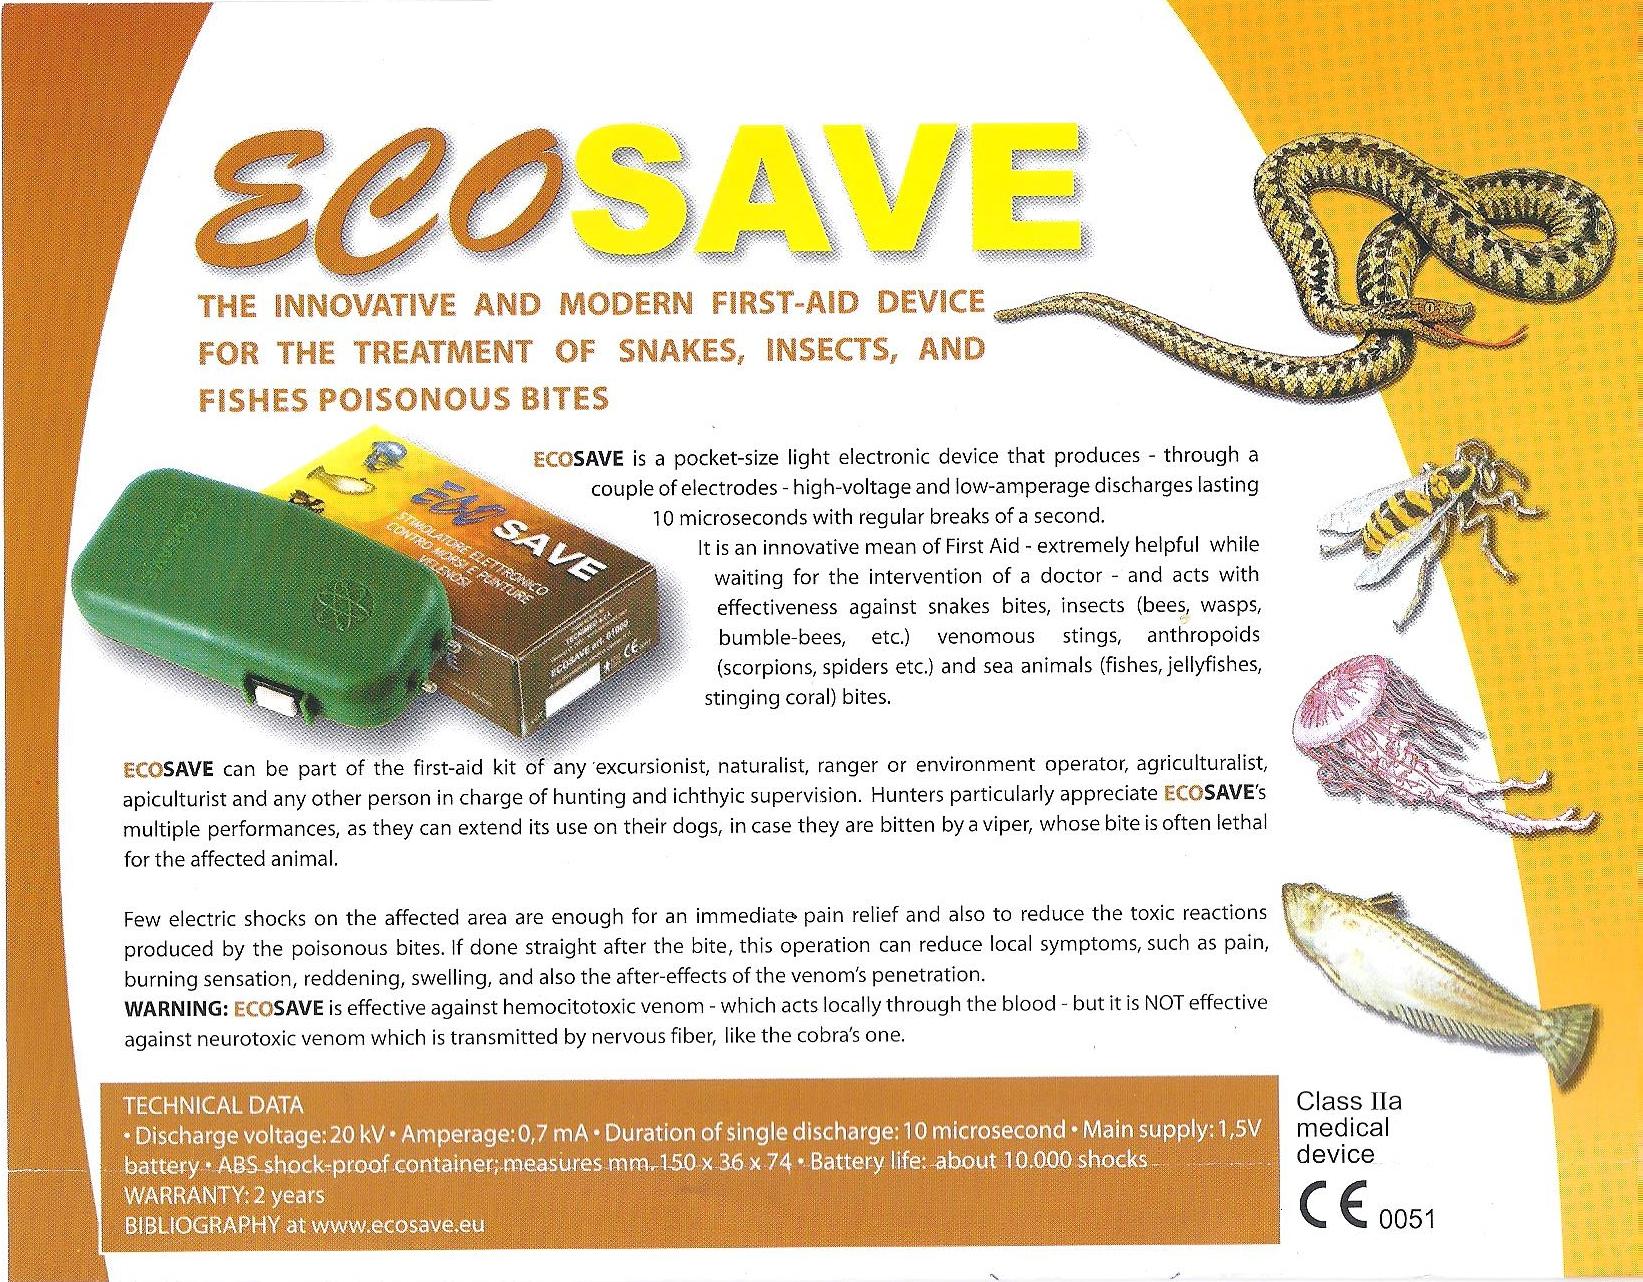 EcoSave